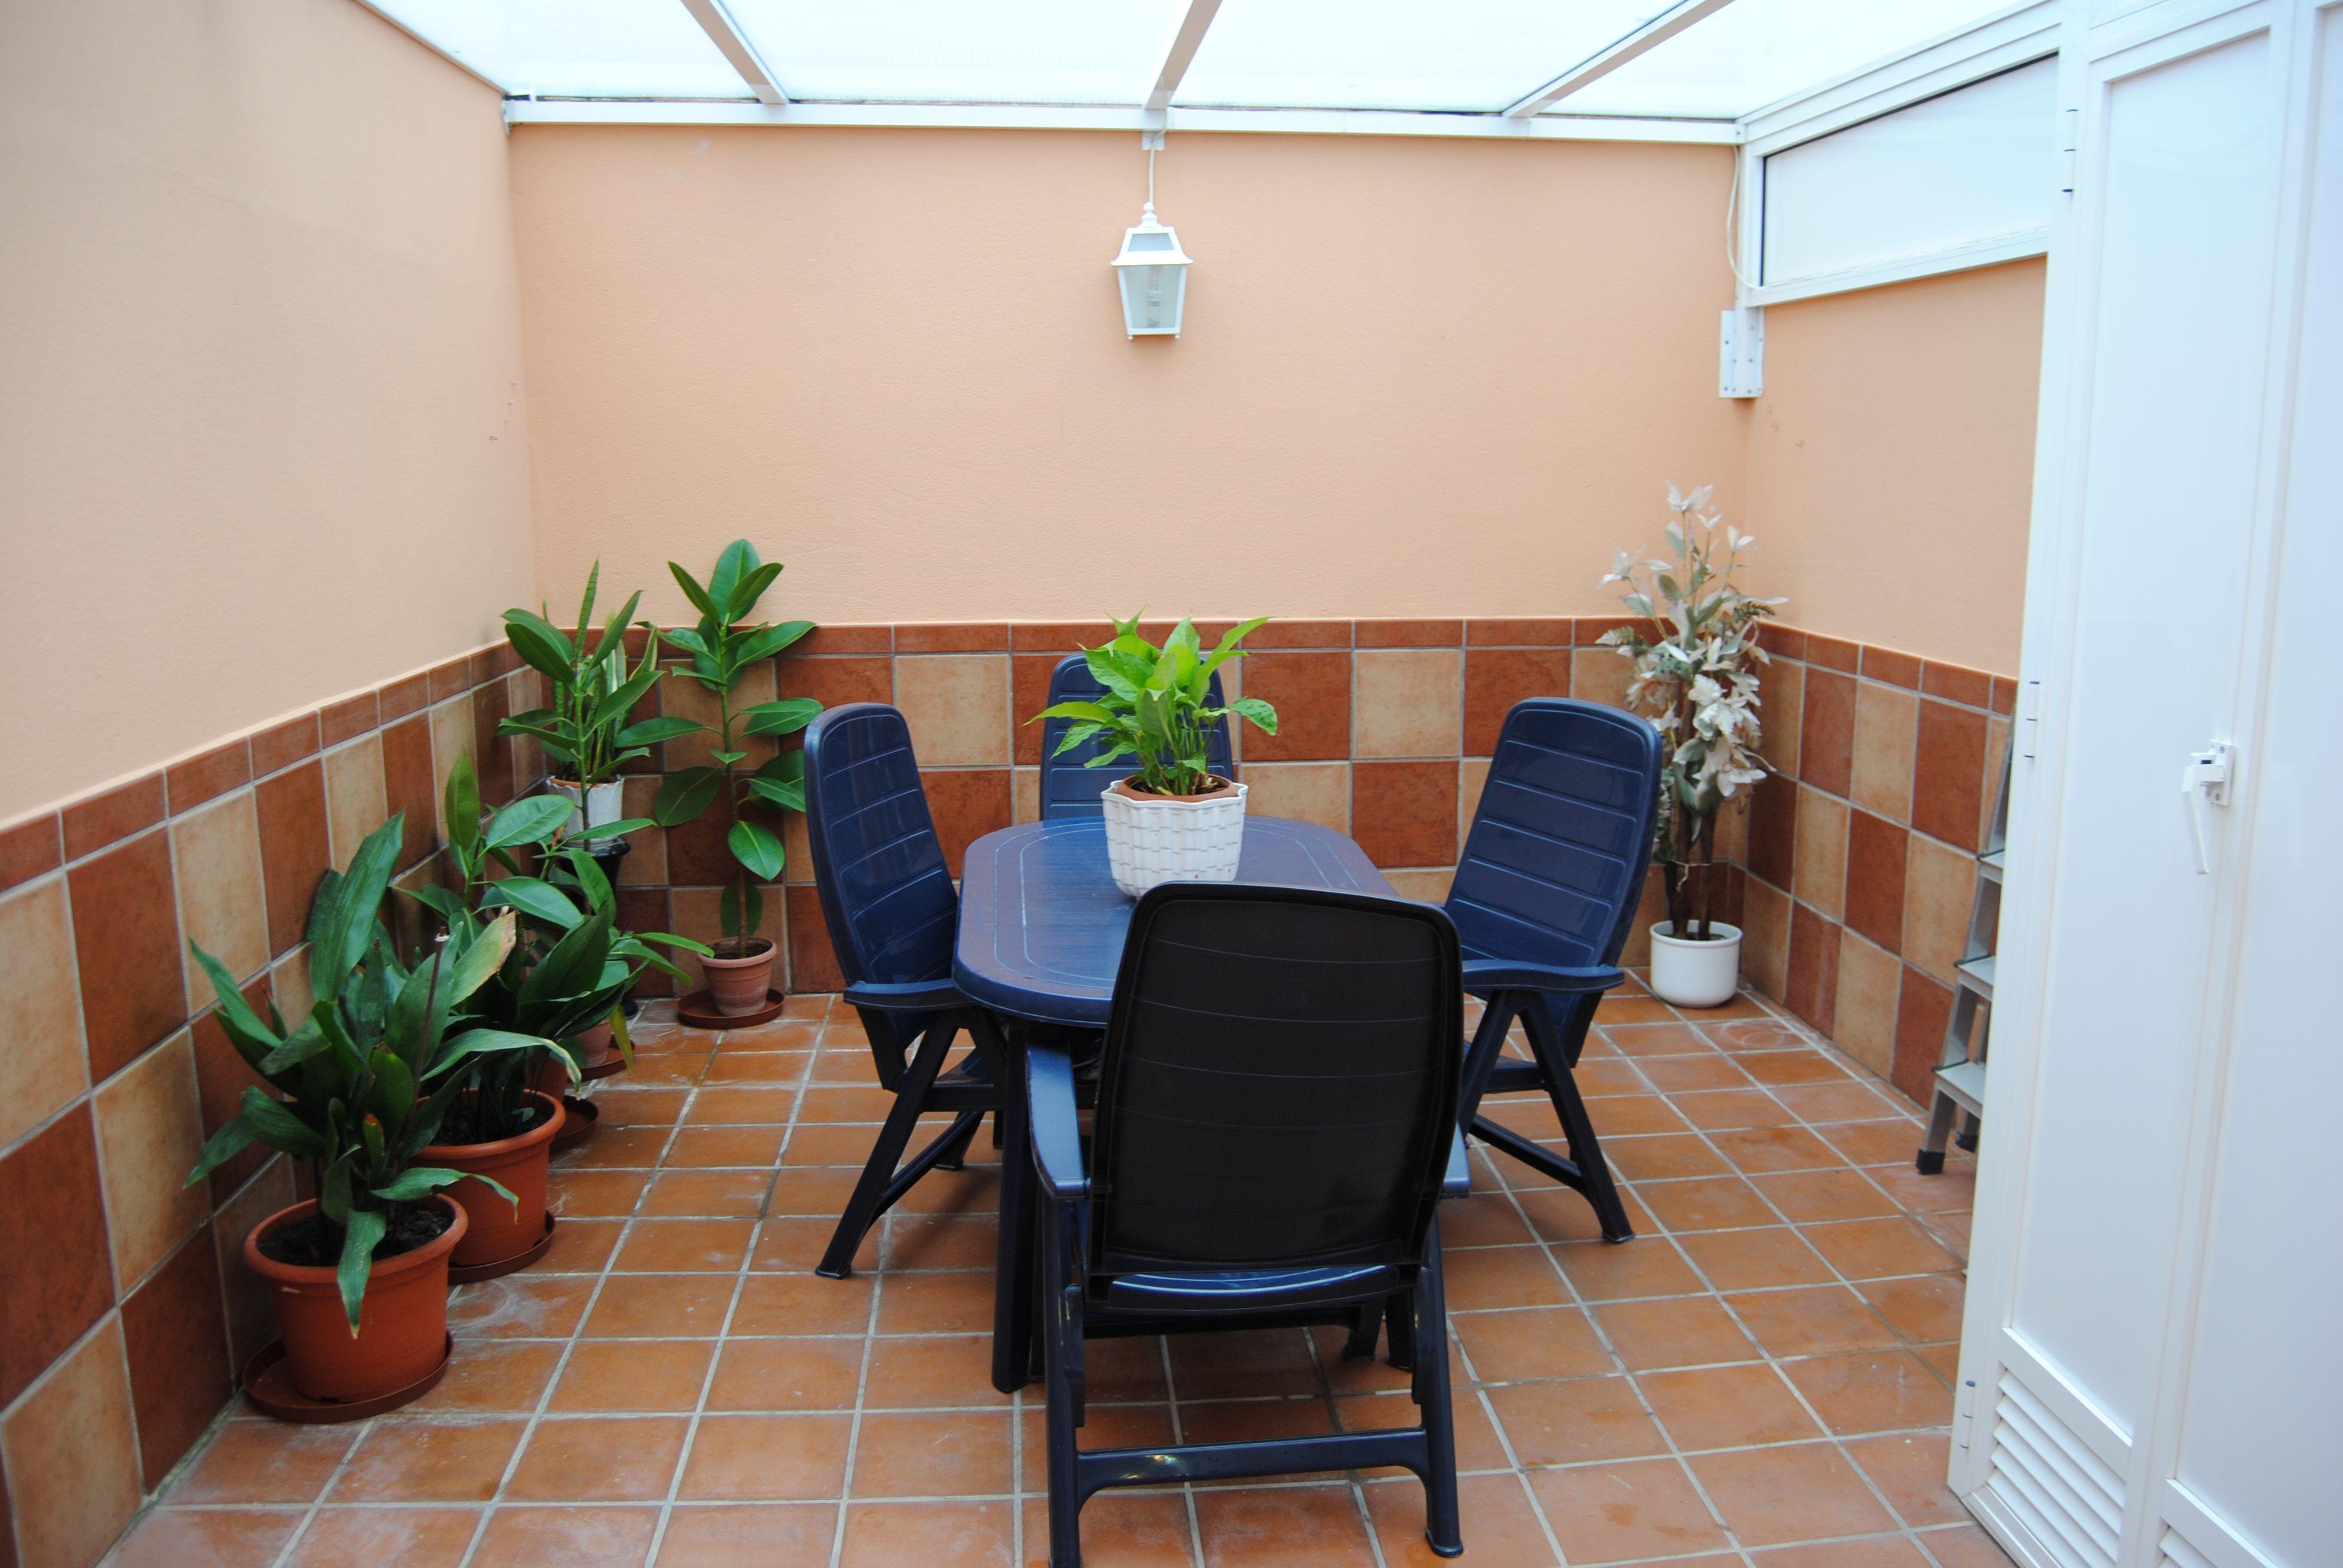 Maravilloso piso vacacional para 4 huéspedes en Fuengirola